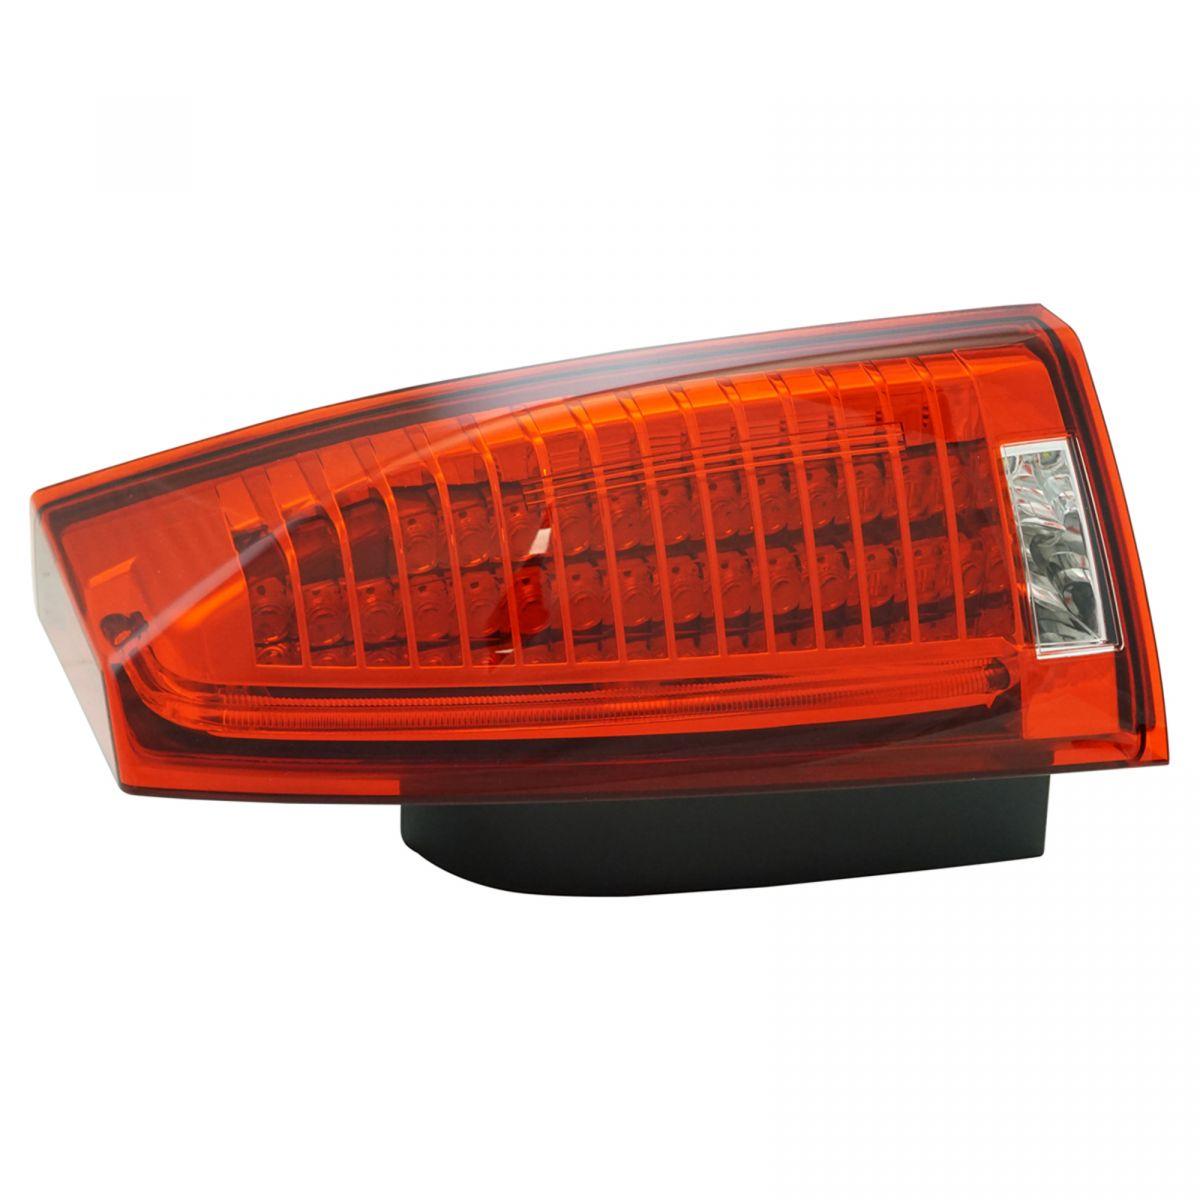 Tail Light Taillight Lamp Assembly Passenger Side RH For